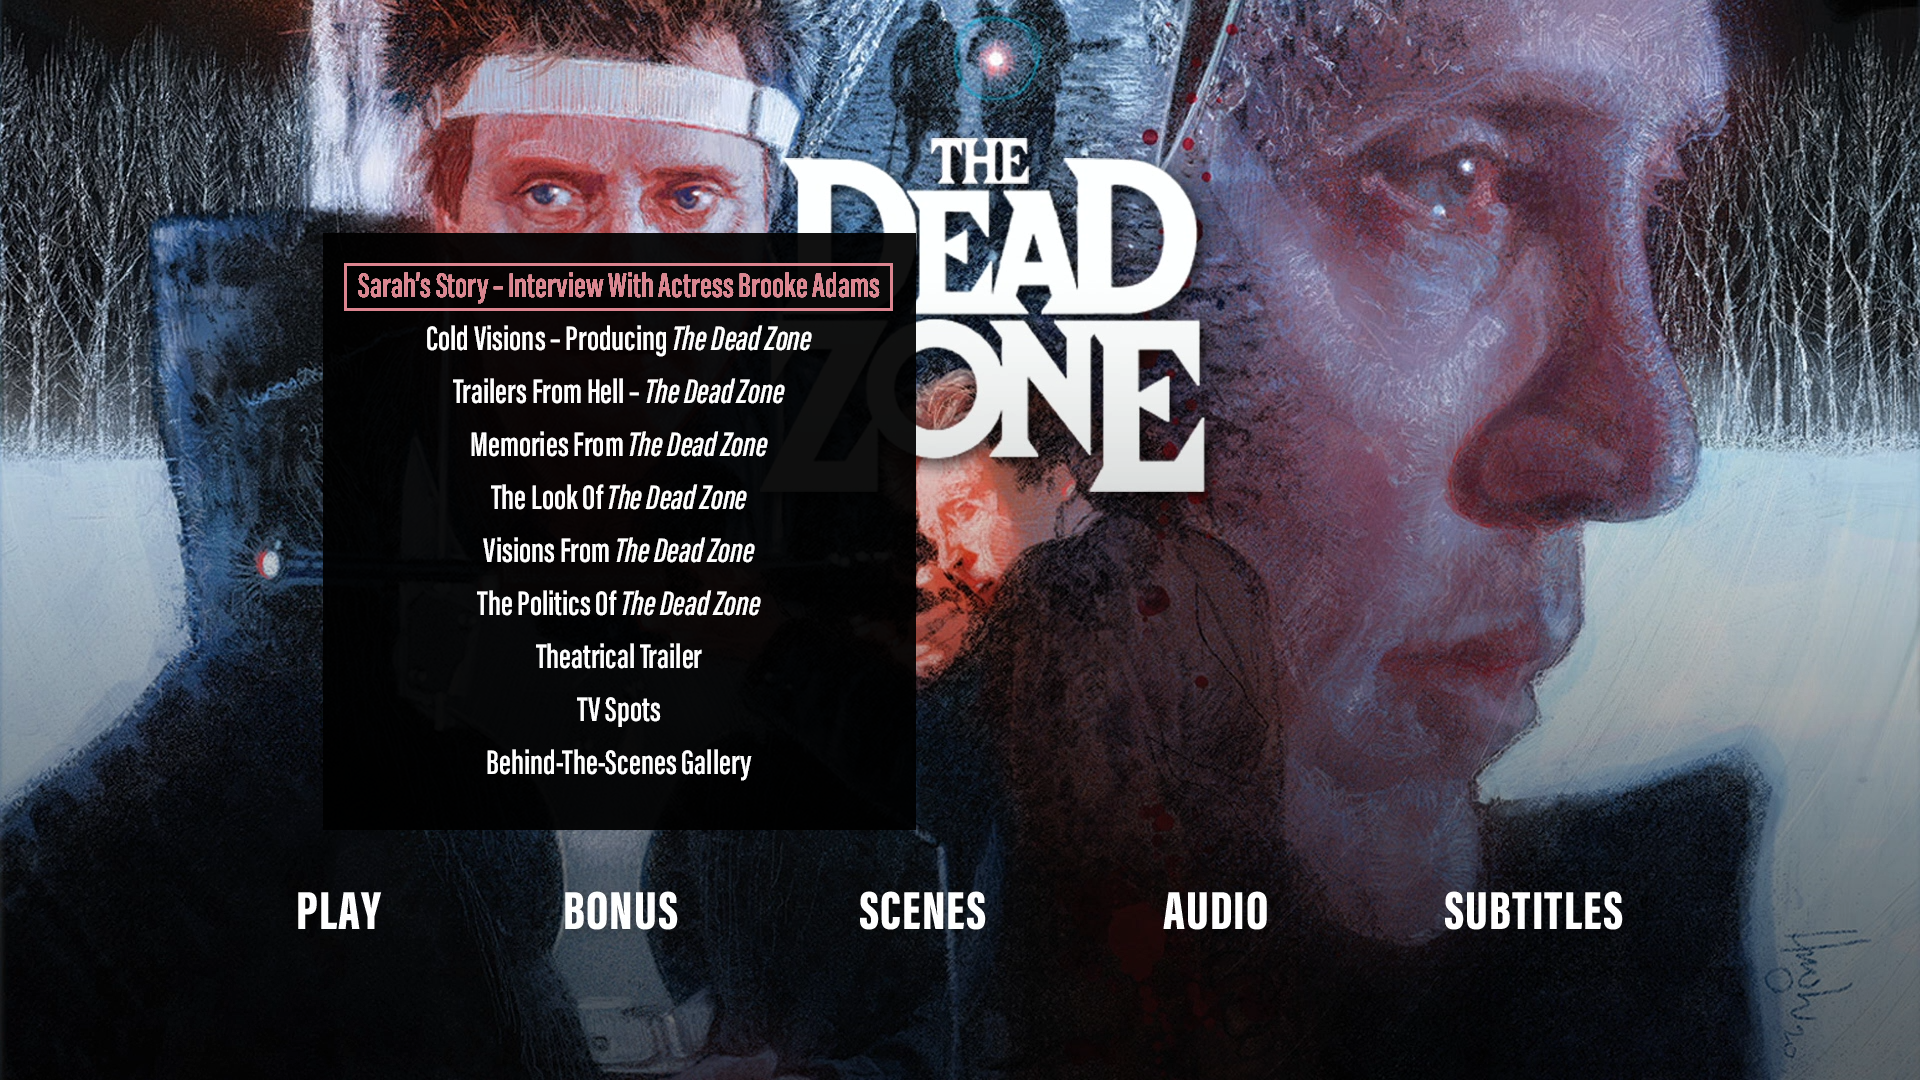 The Dead Zone extras menu